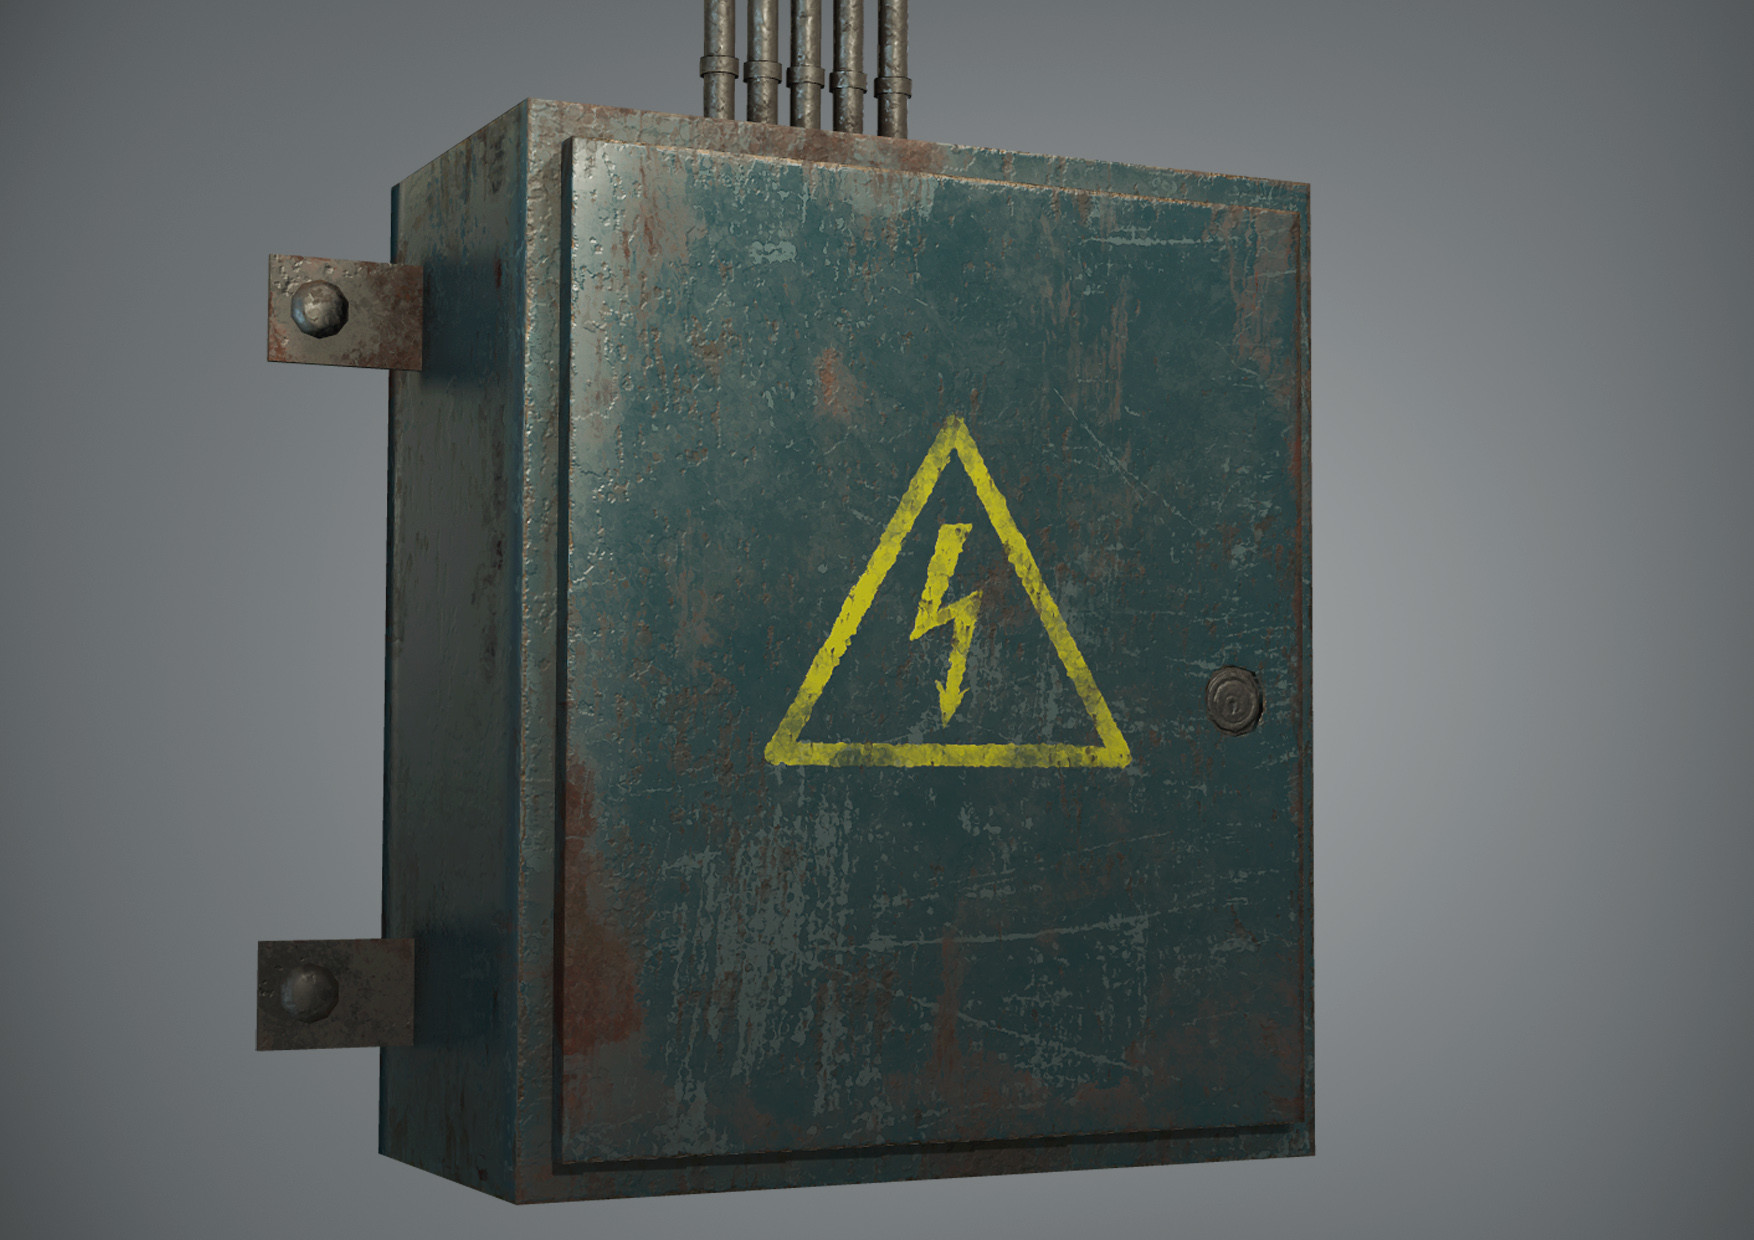 Andrew constantine electricbox